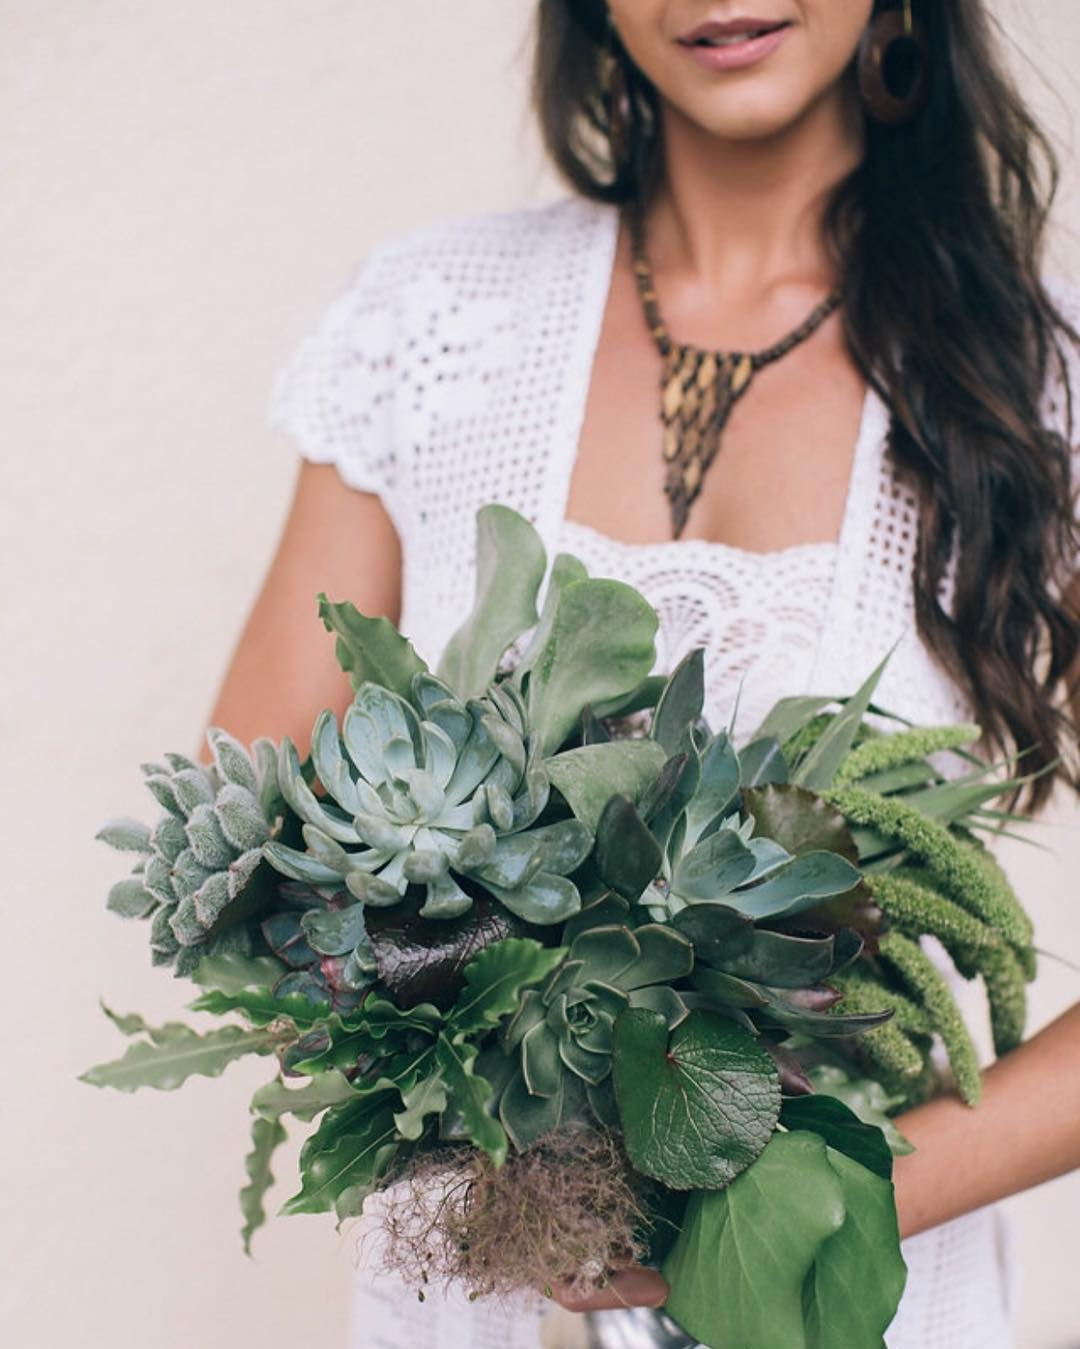 {green} photo | @katepreftakes4  #bouquet #succulents #simple #green #botanical #accessory #bridebling #bohostyle #photoshoot #weddingchicks #collaboration #lotusfloraldesigns